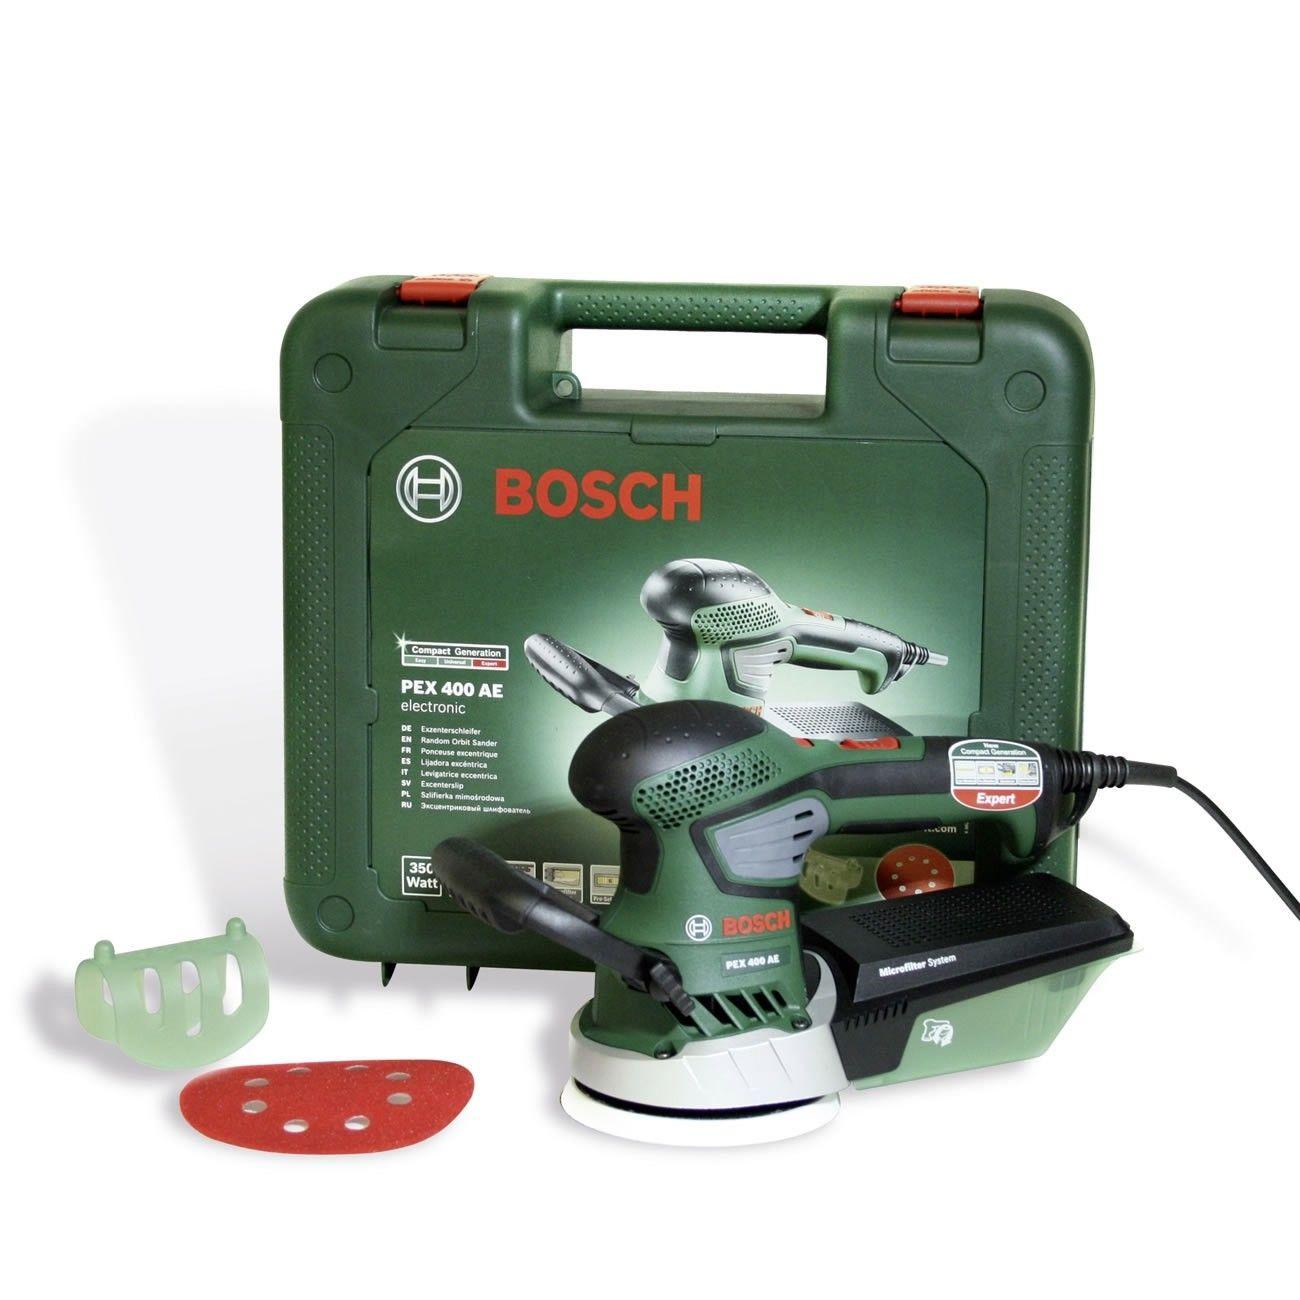 Bekend Bosch PEX 400 AE kopen? | Snelle levering - Fixami.be HW06